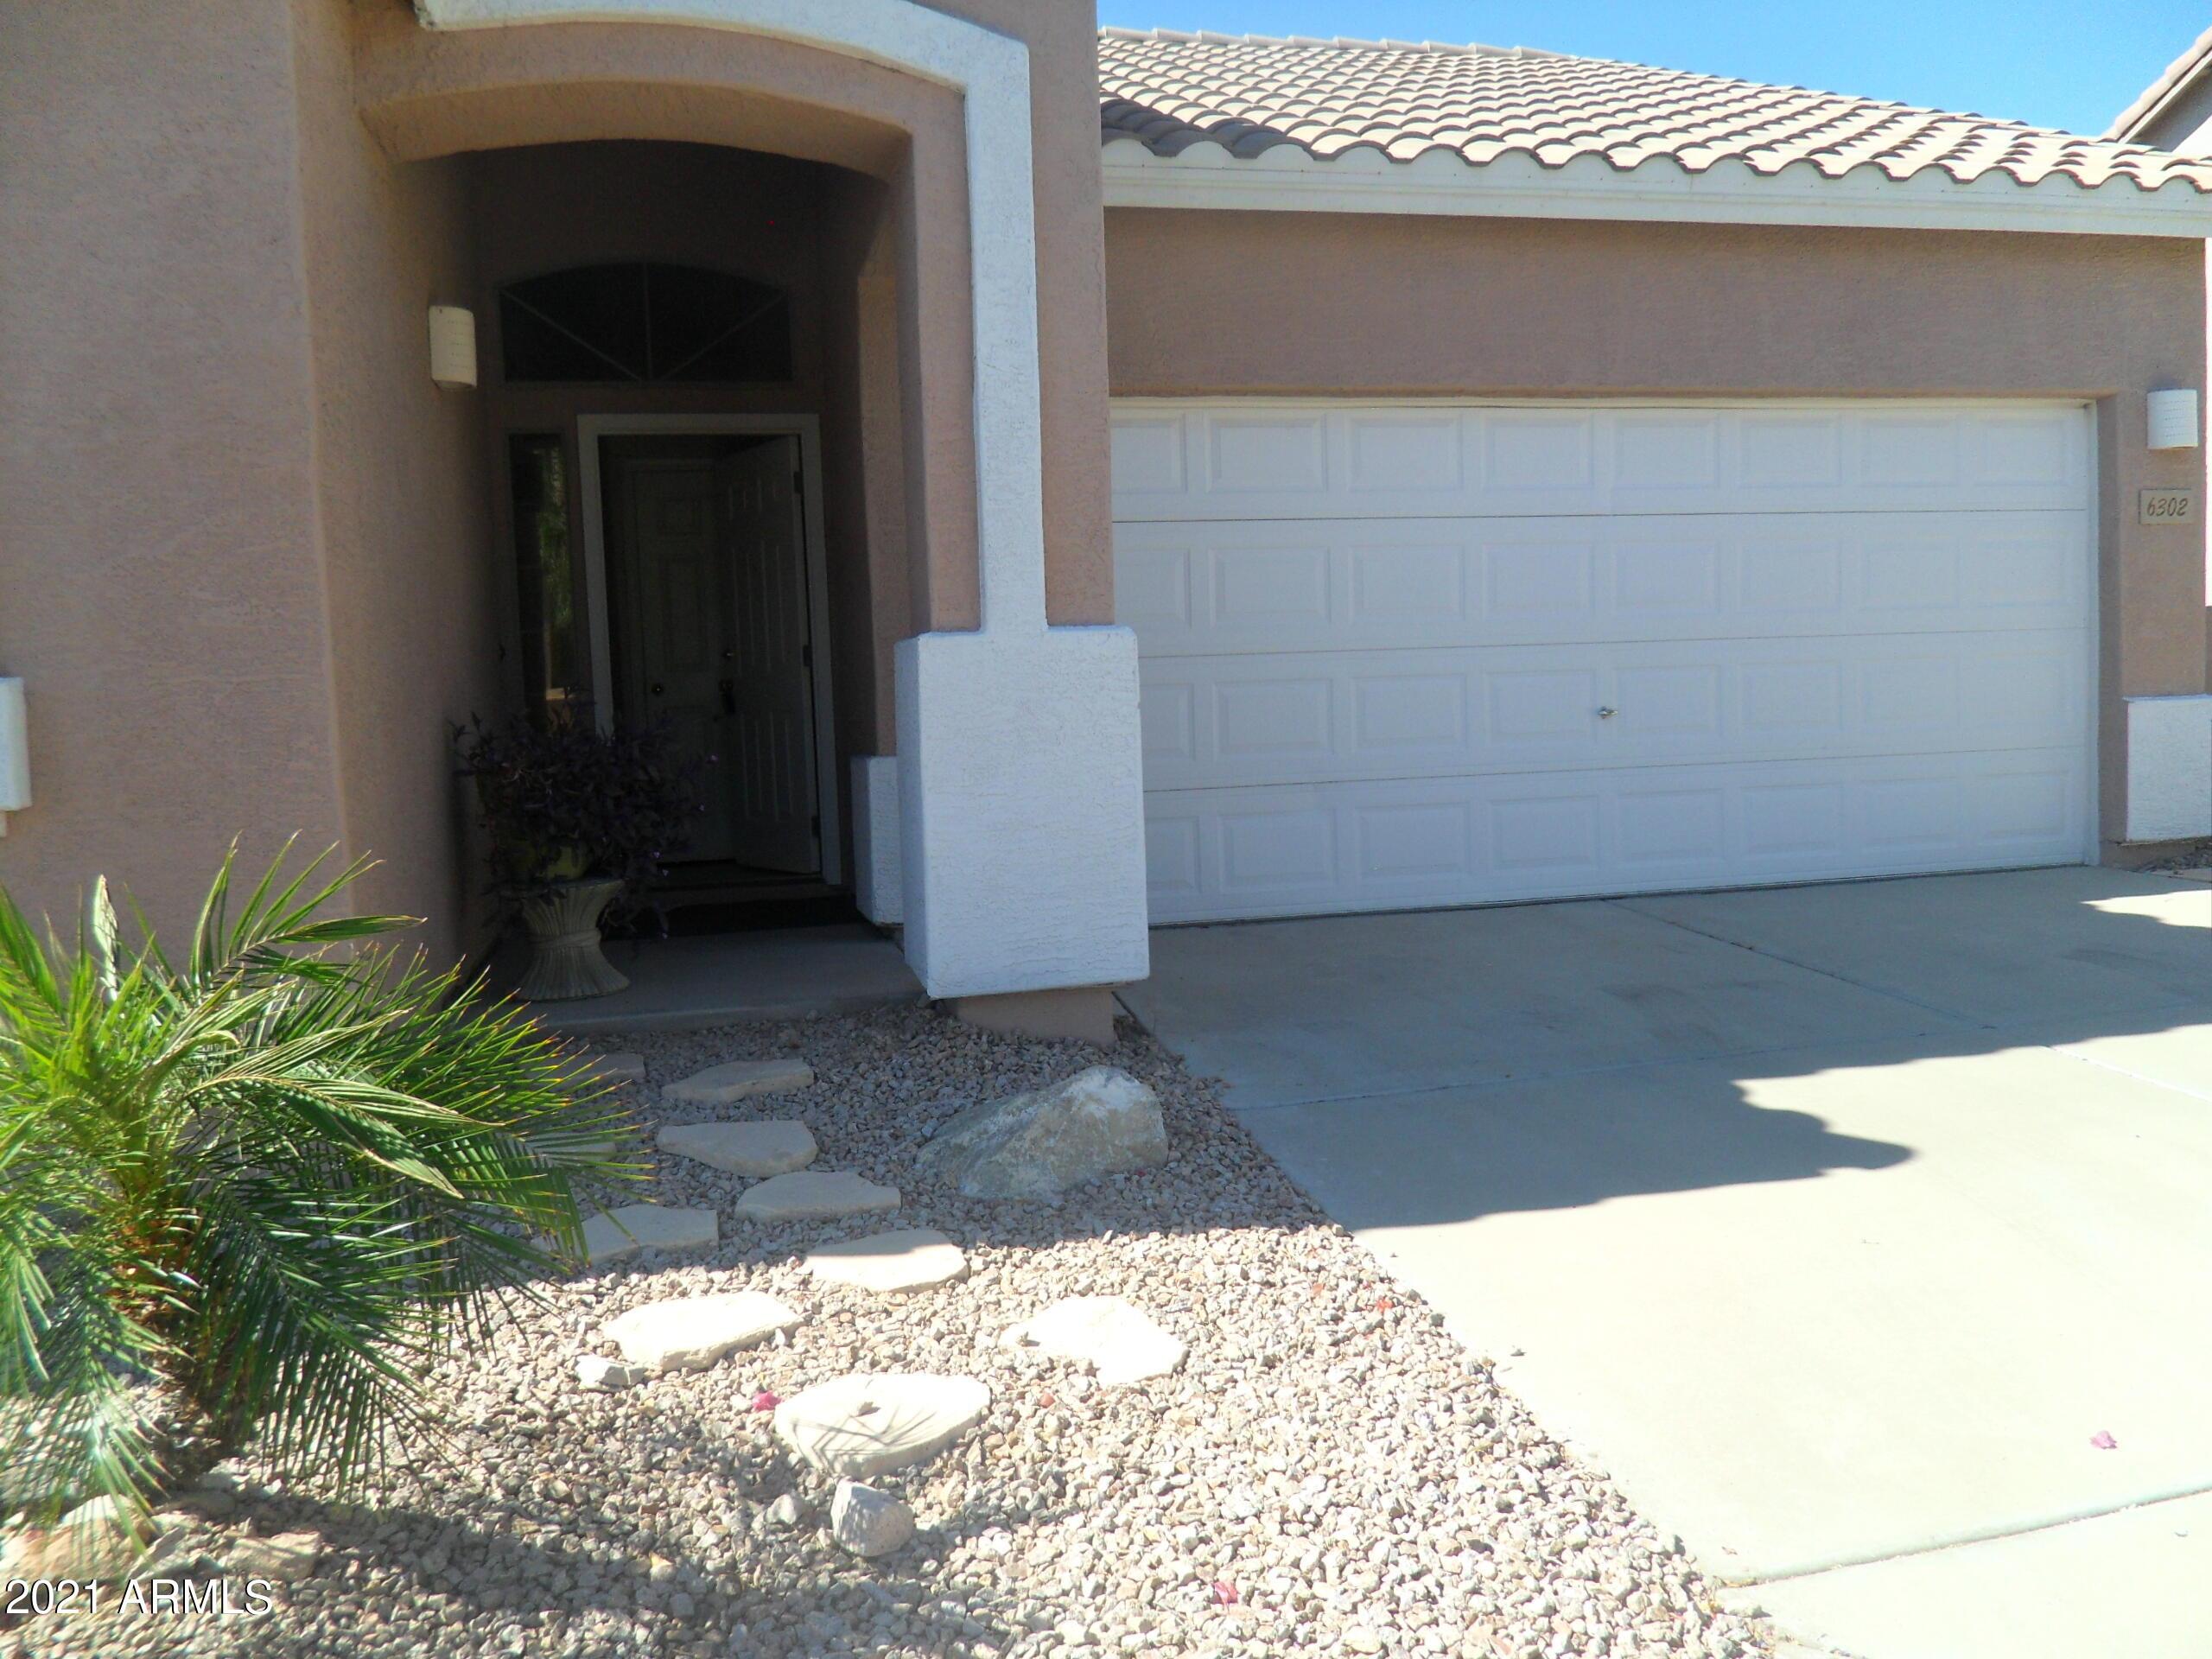 6302 S MESA VISTA Drive, Gold Canyon, AZ 85118, 3 Bedrooms Bedrooms, ,Residential Lease,For Rent,6302 S MESA VISTA Drive,6248415